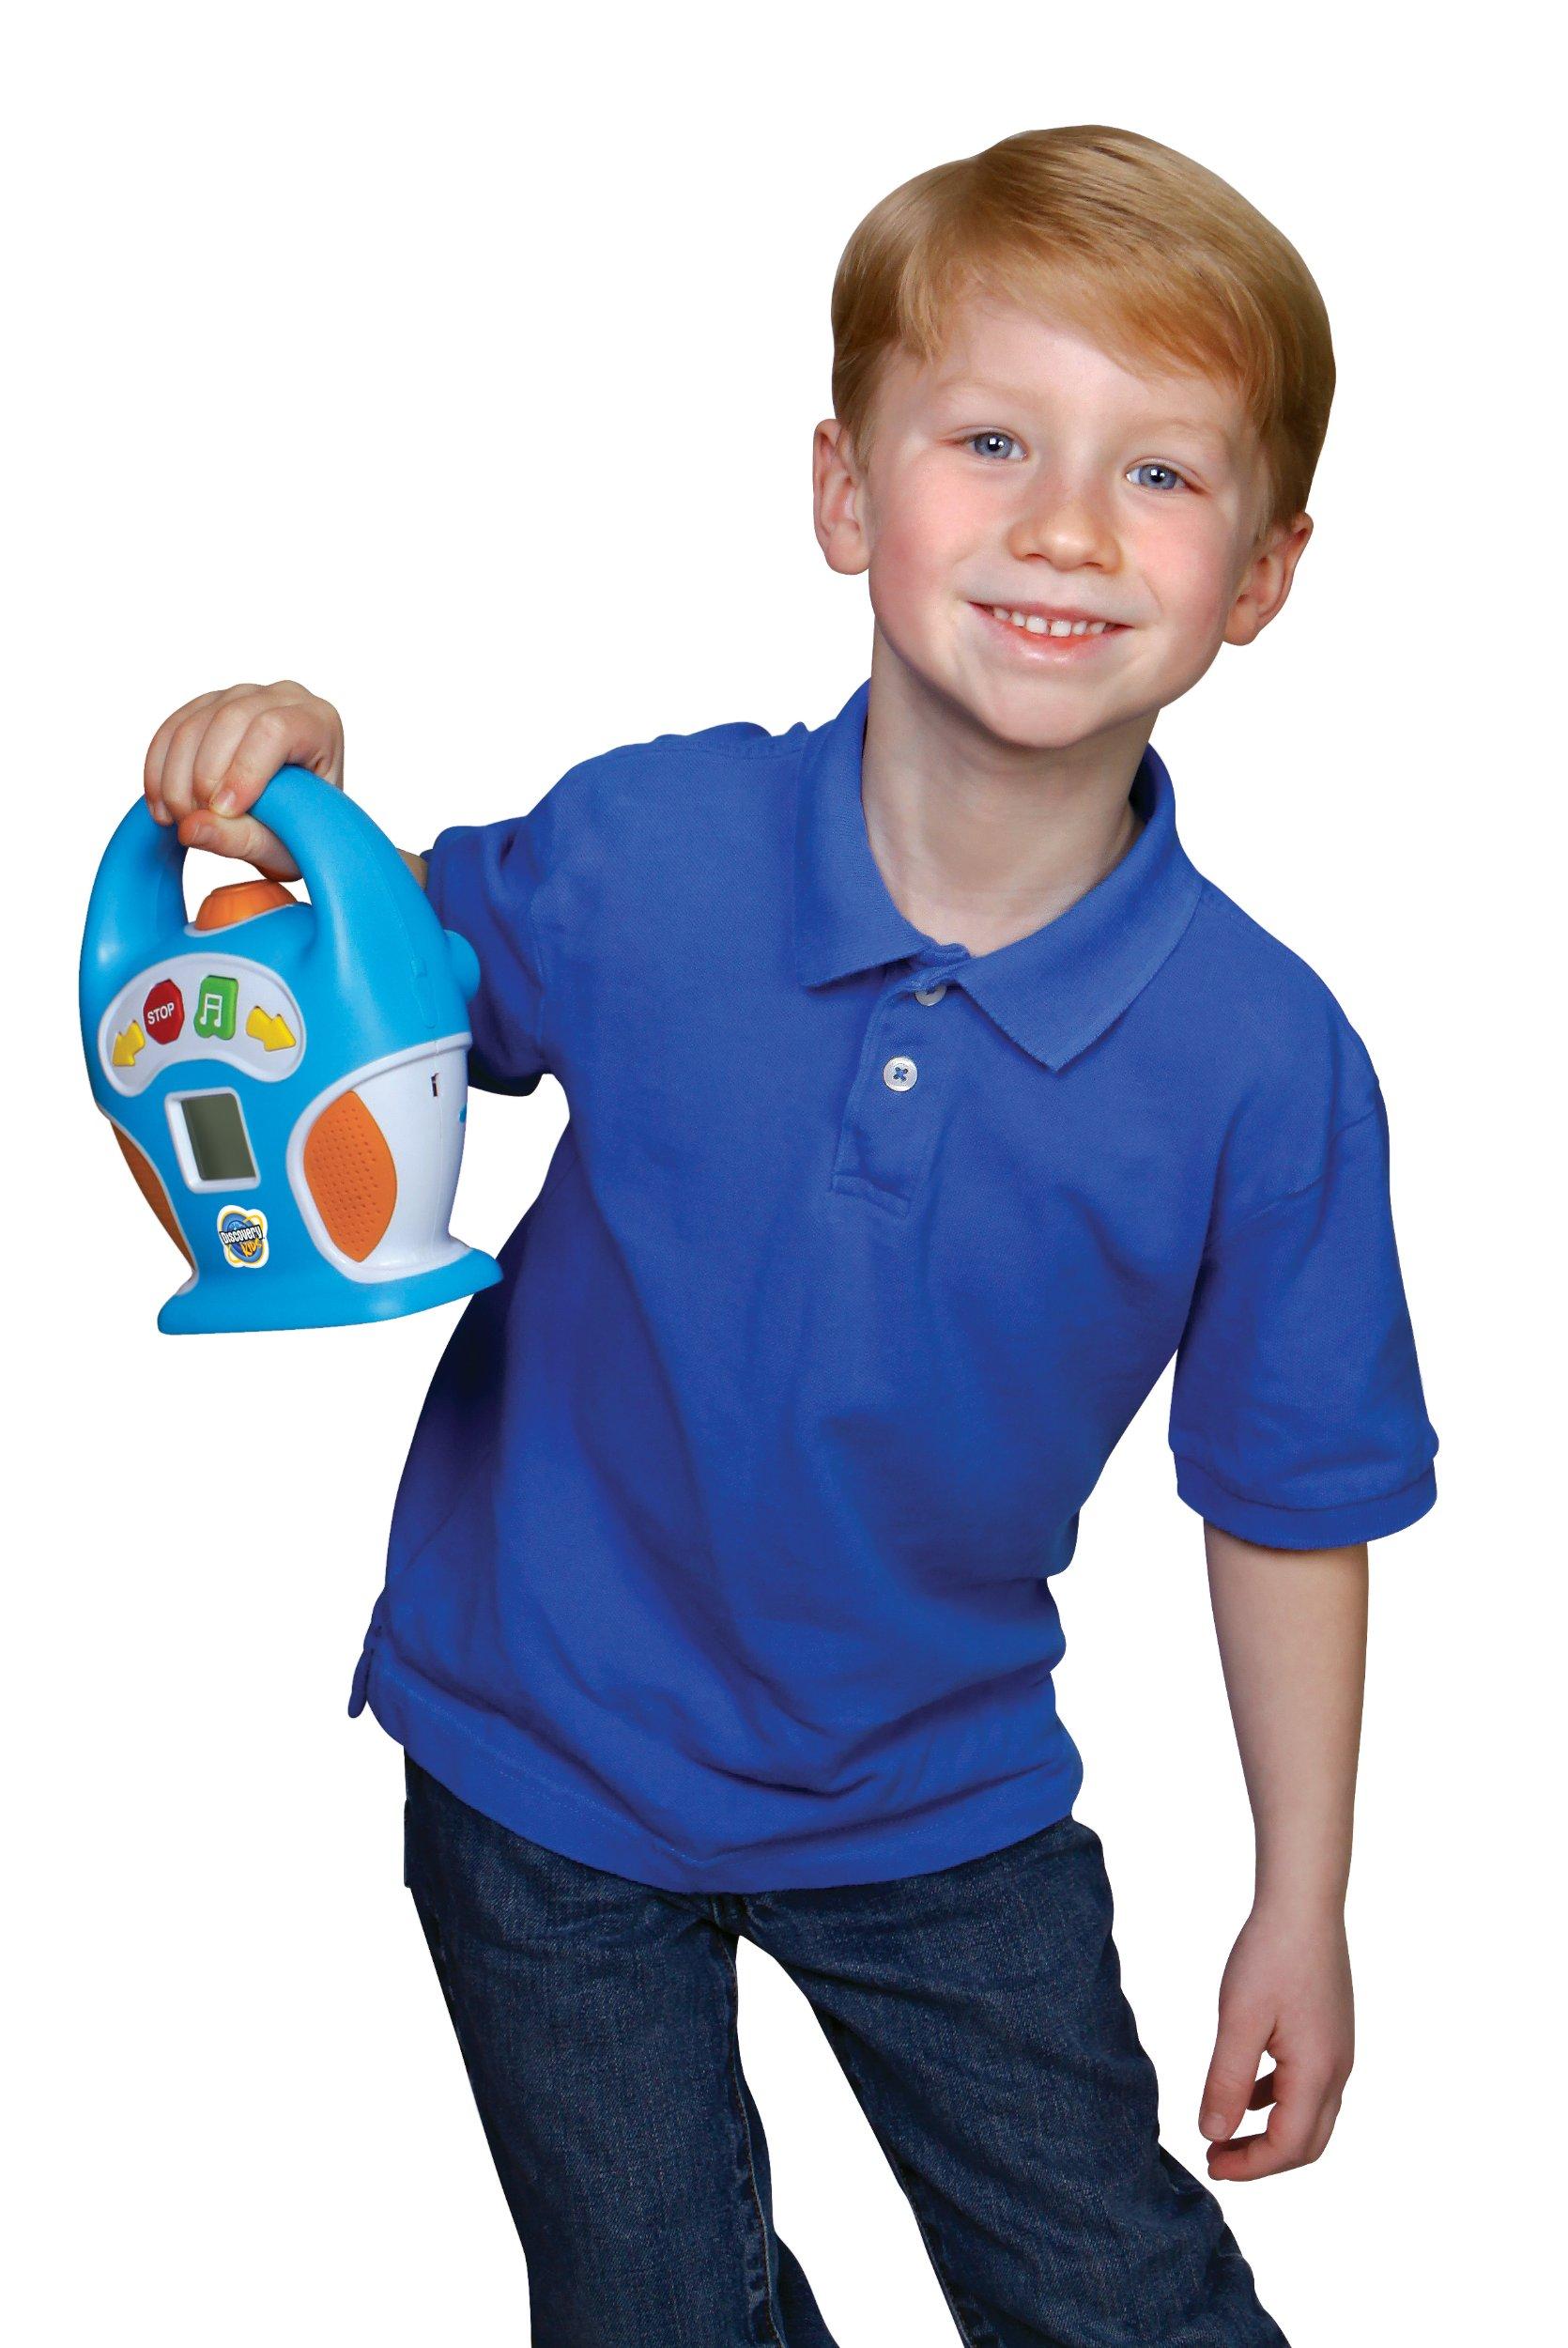 Discovery Kids 256MB Kids Digital Boombox MP3 Player